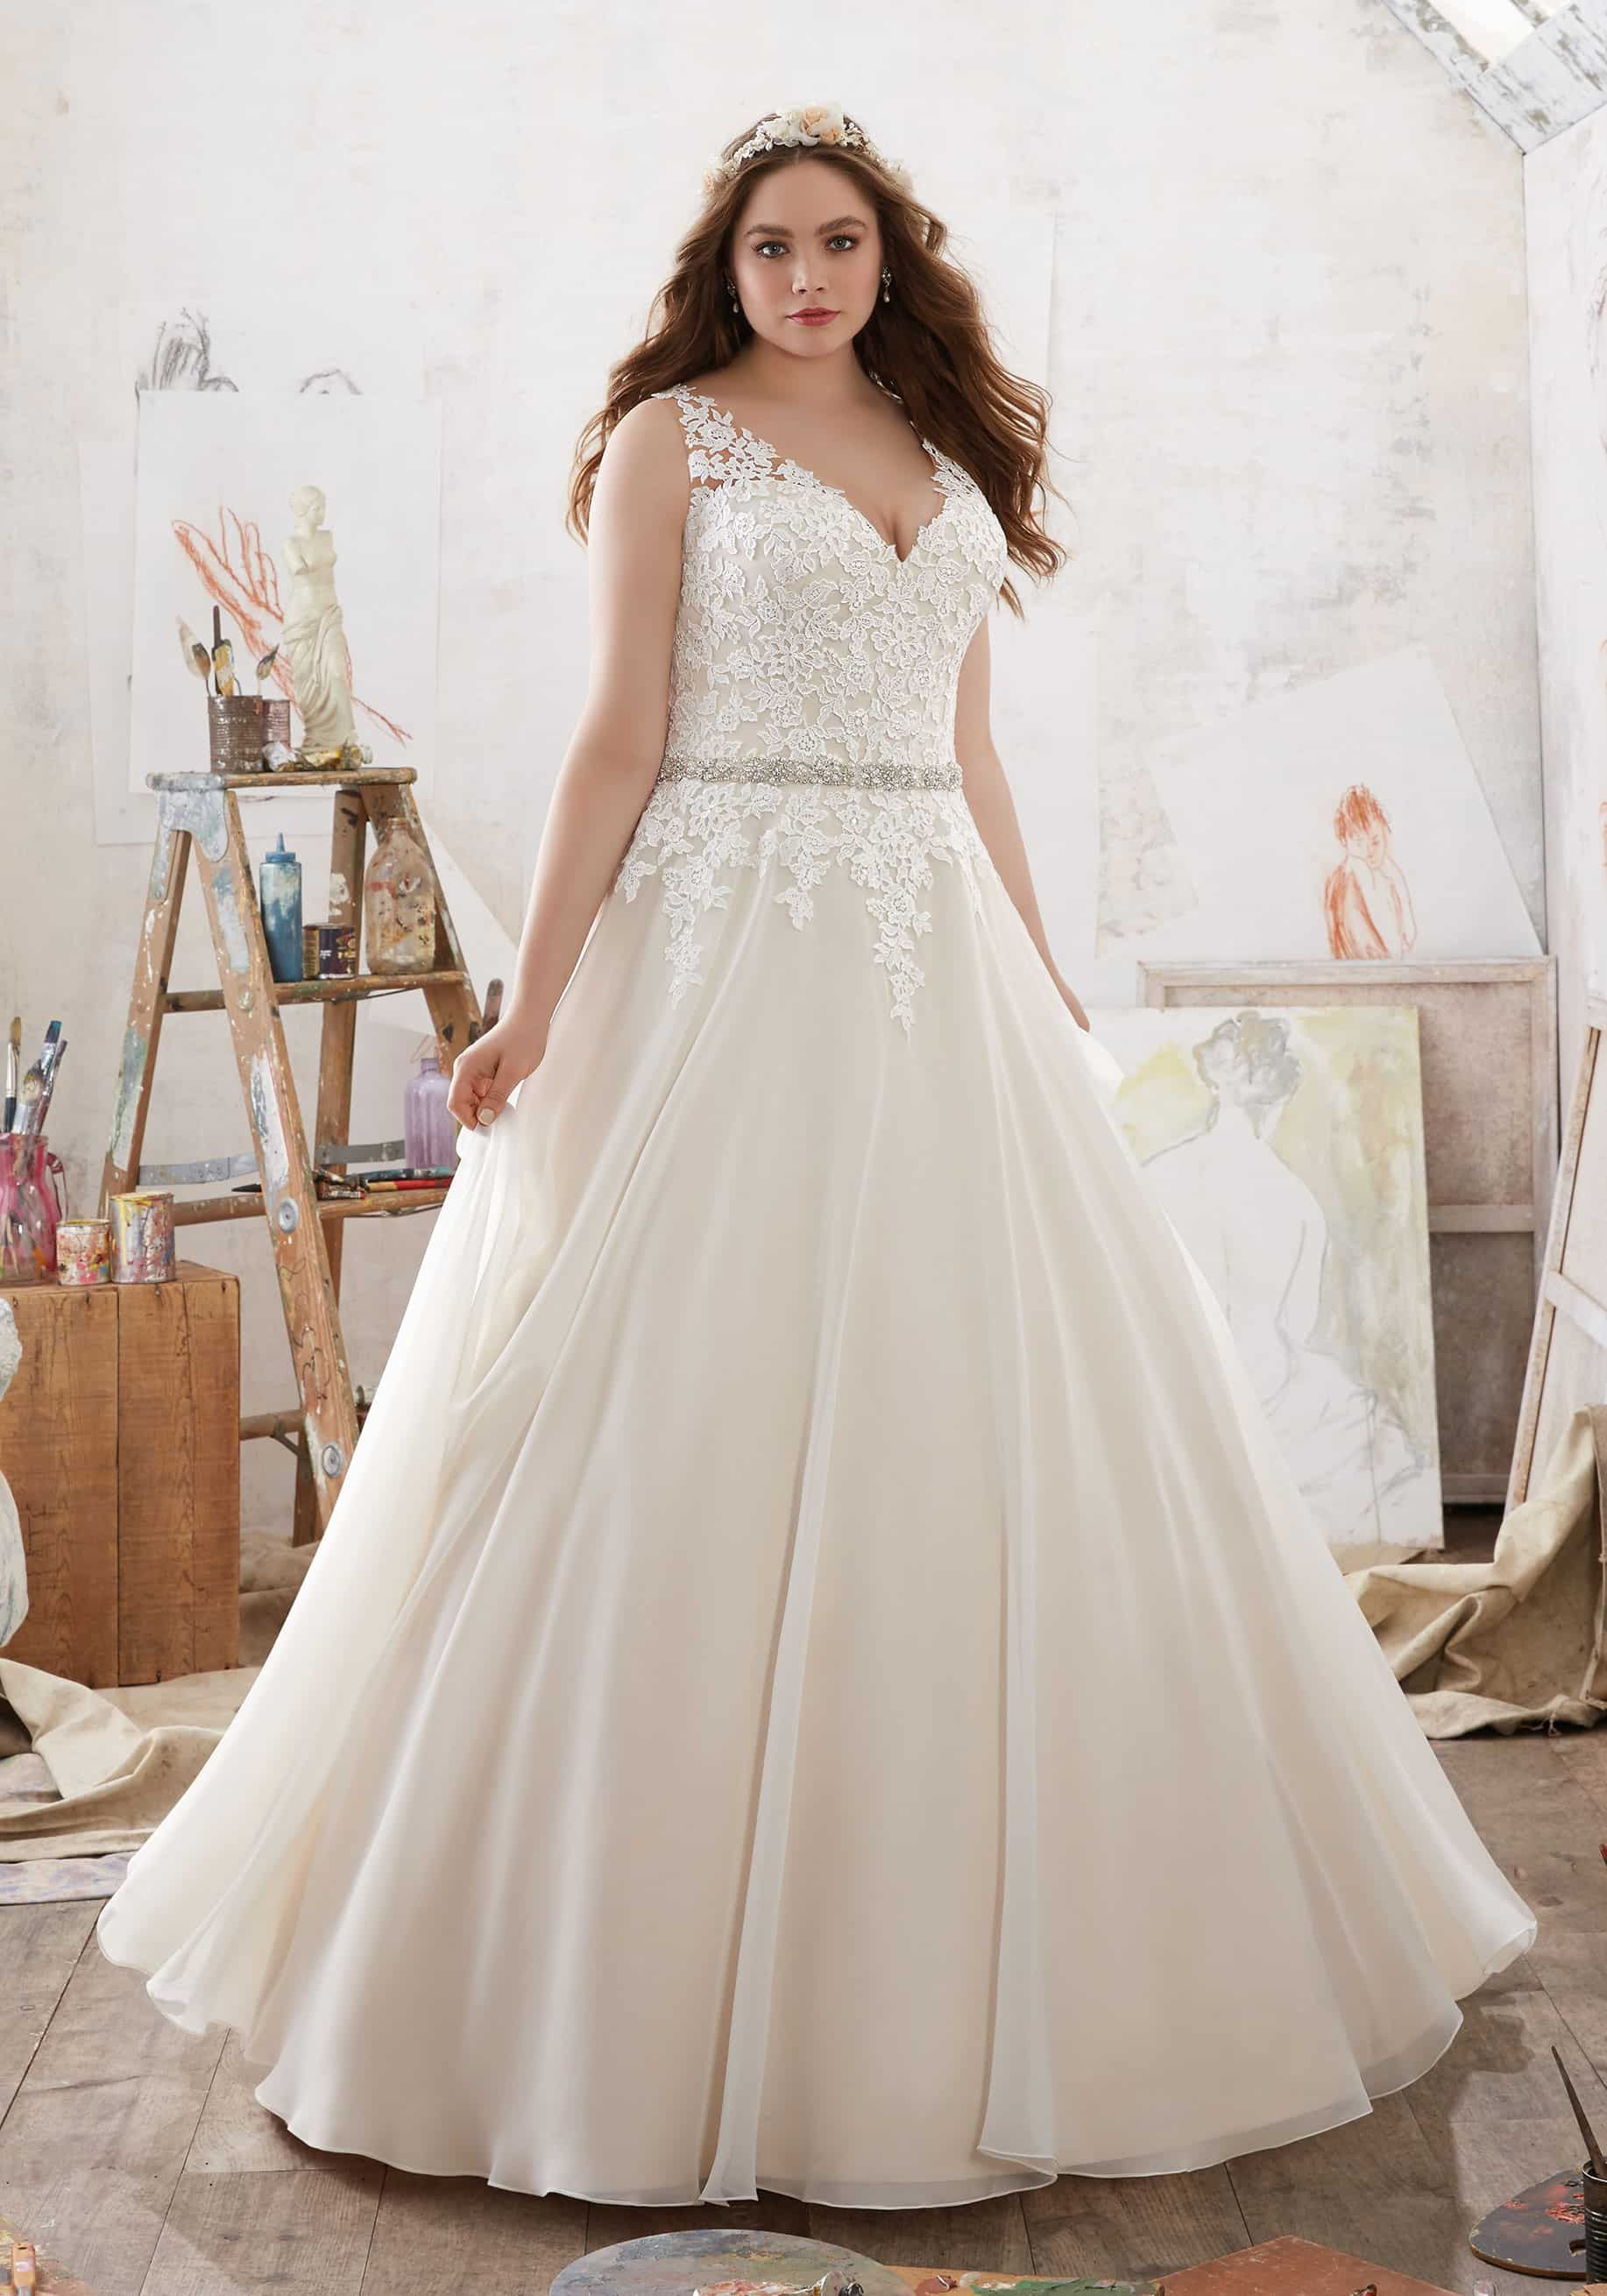 فساتين زفاف للسمينات كولكشن فساتين مودرن مقاسات كبيرة Plus Size Wedding Gowns Winter Wedding Dress Best Wedding Dresses